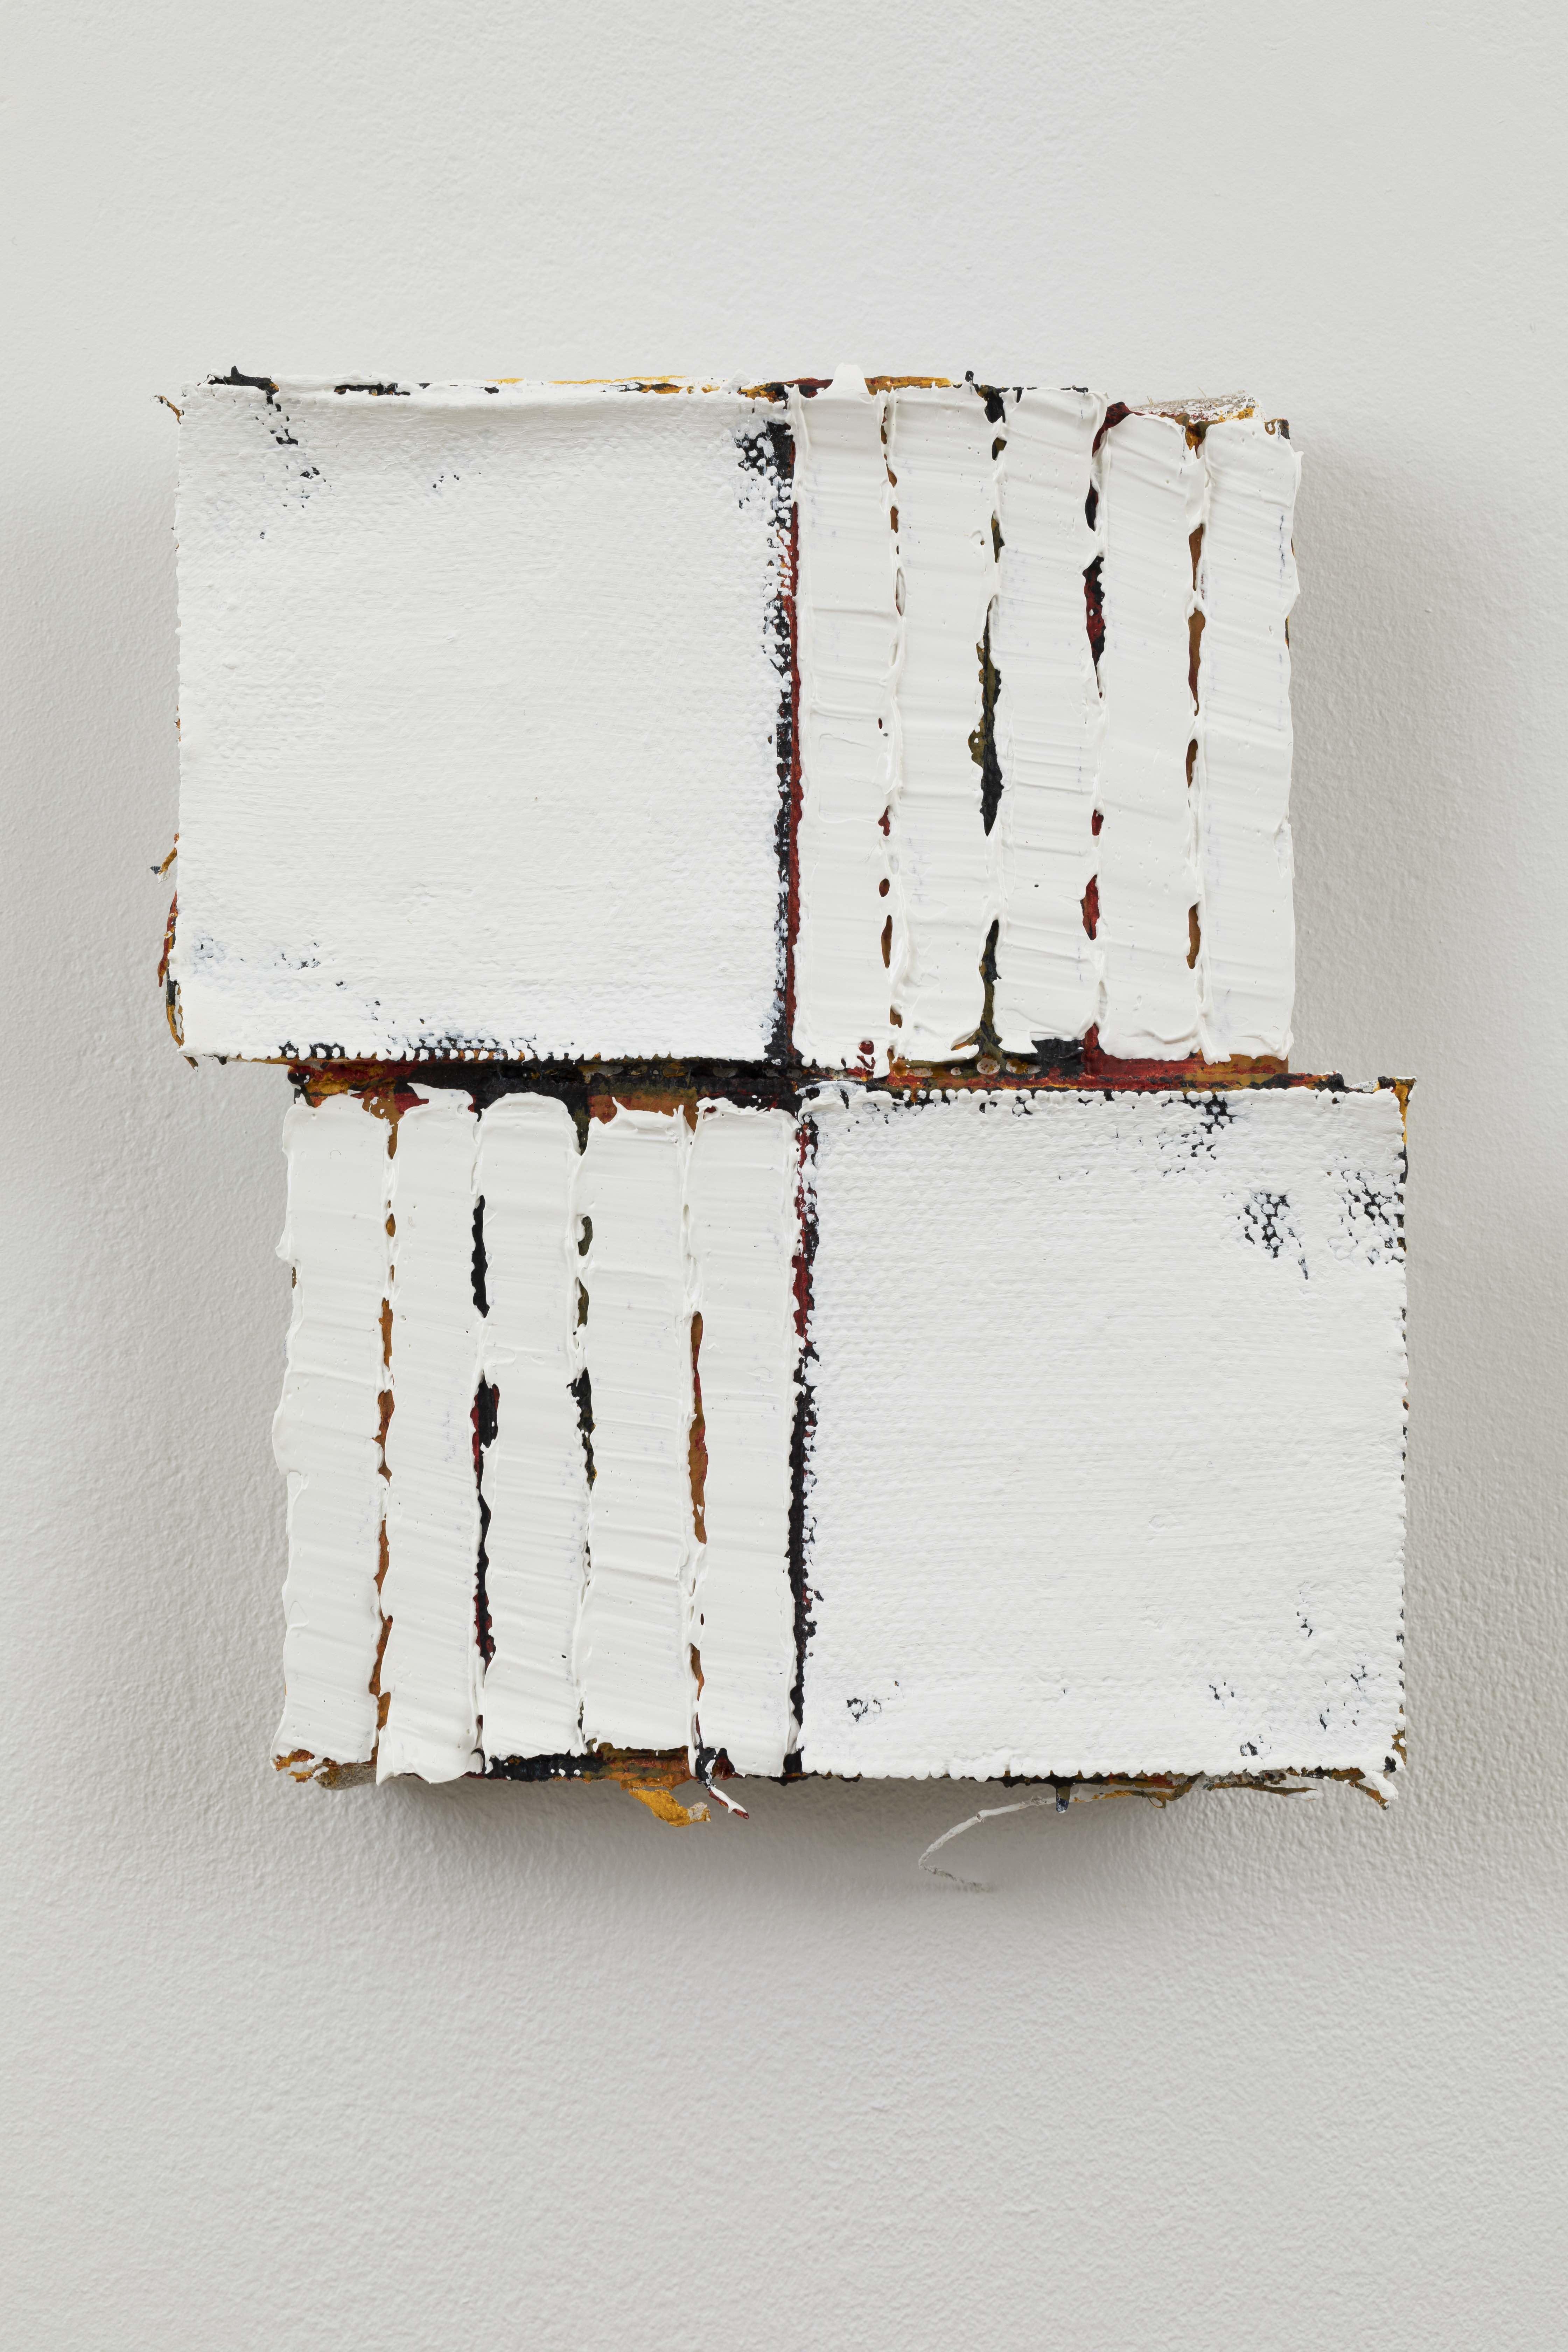 Adam Winner, A Capable Being, 2020, Oil on linen, 62.20h x 50.80w x 5d cm 24.49h x 20w x 1.97d in, Angel Gil/Courtesy of Galerie Forsblom.